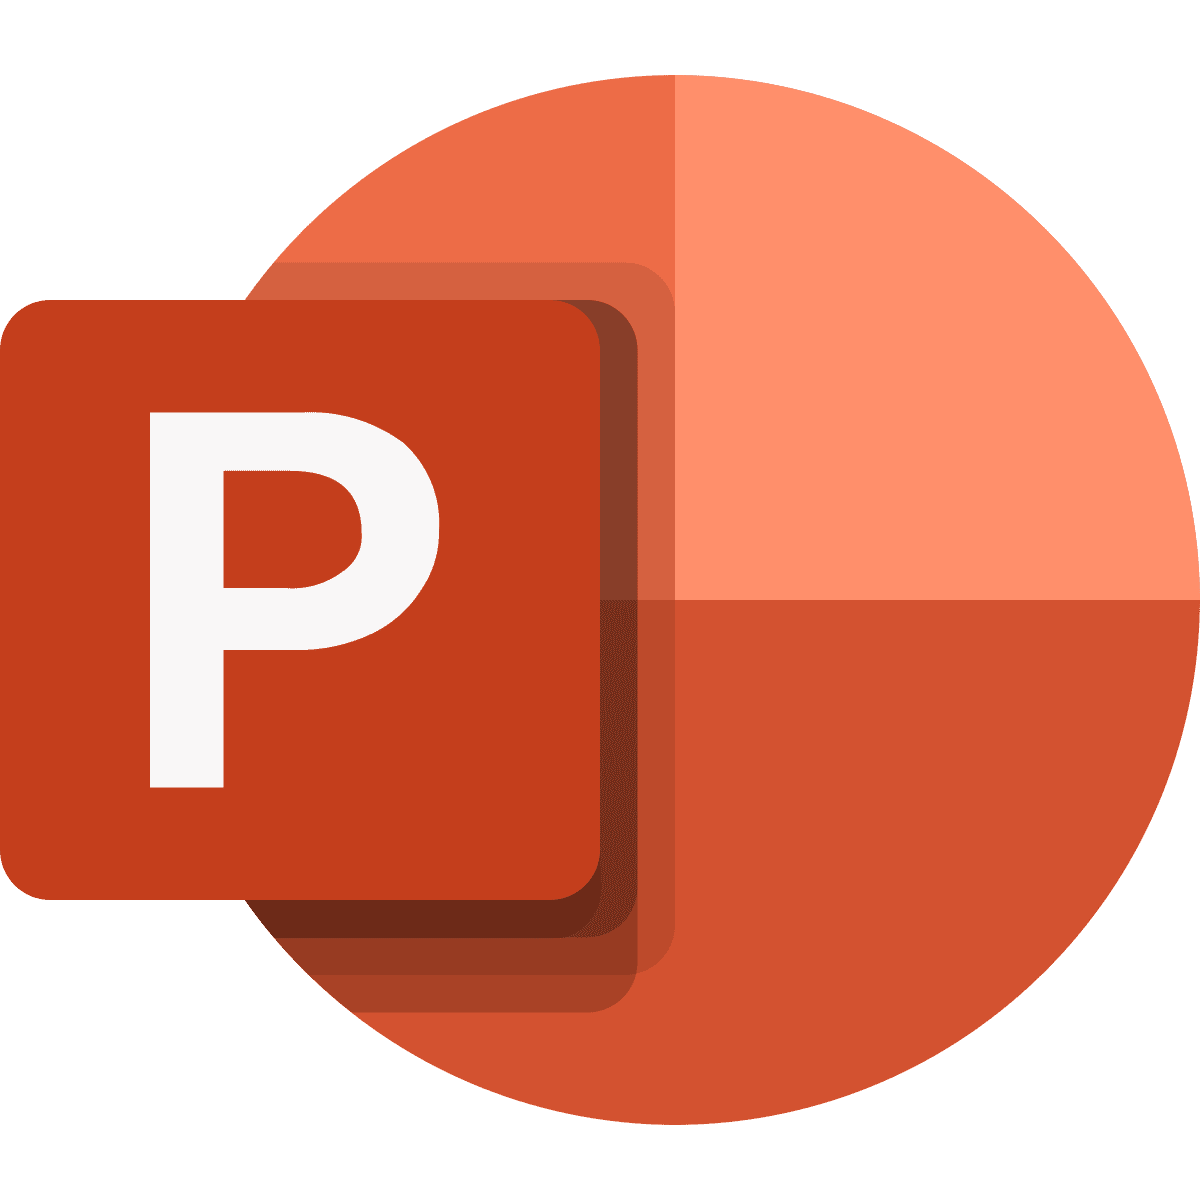 Microsoft Office – Powerpoint 2013